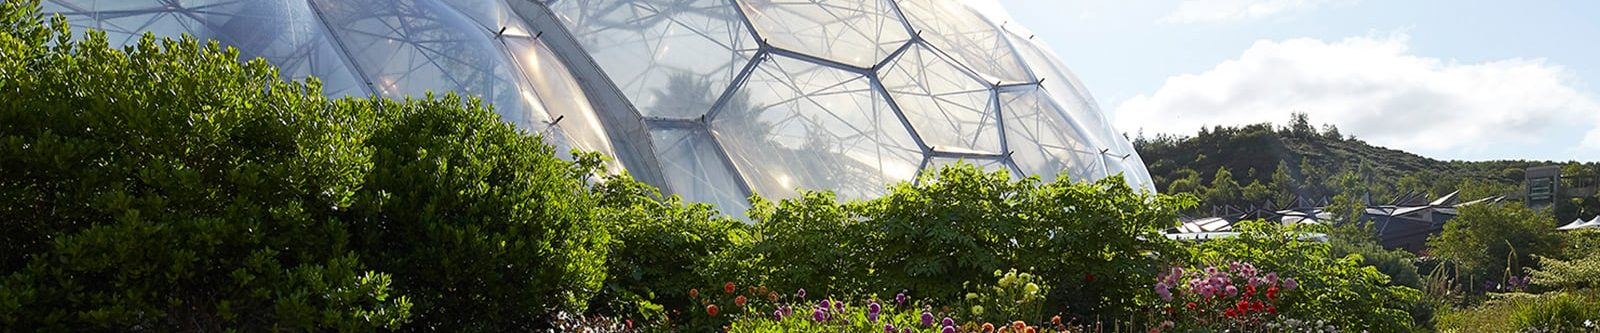 bushes and biomes